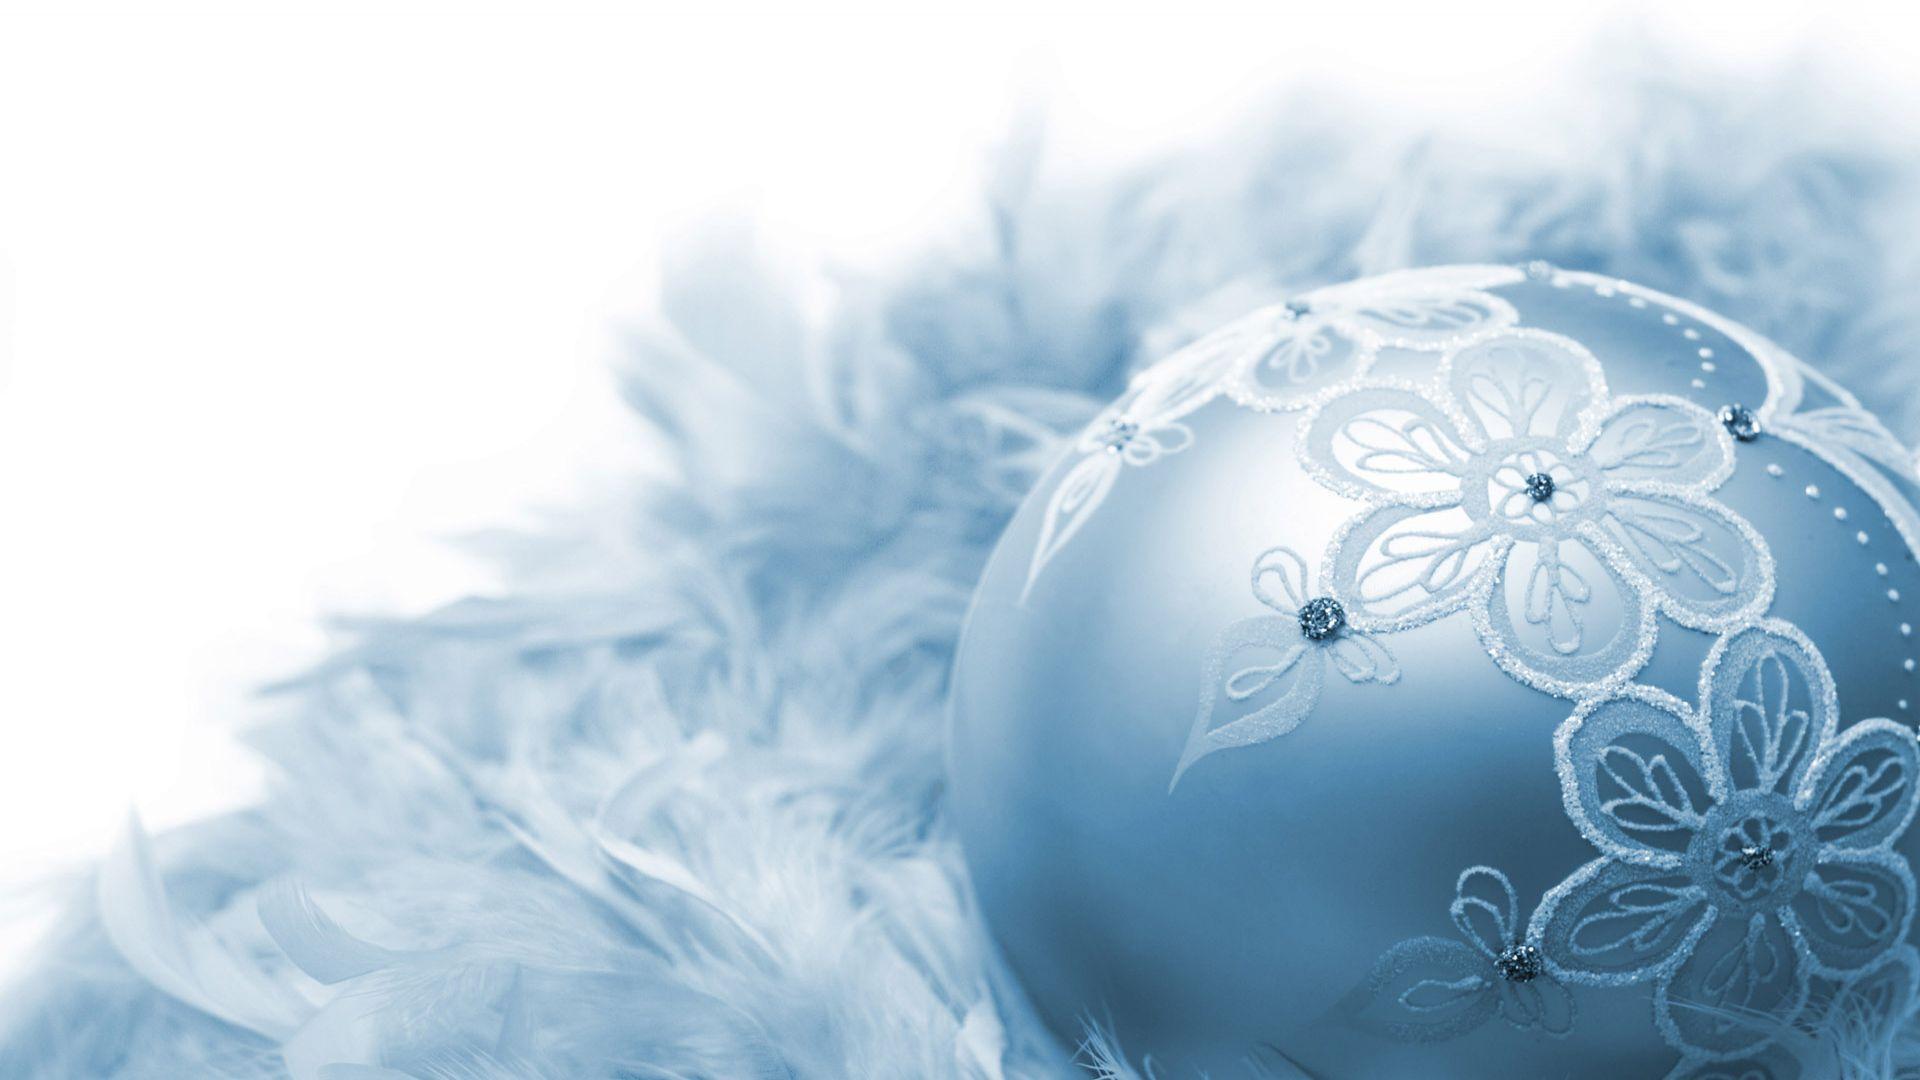 Xmas Stuff For > Christmas Ornament Wallpaper